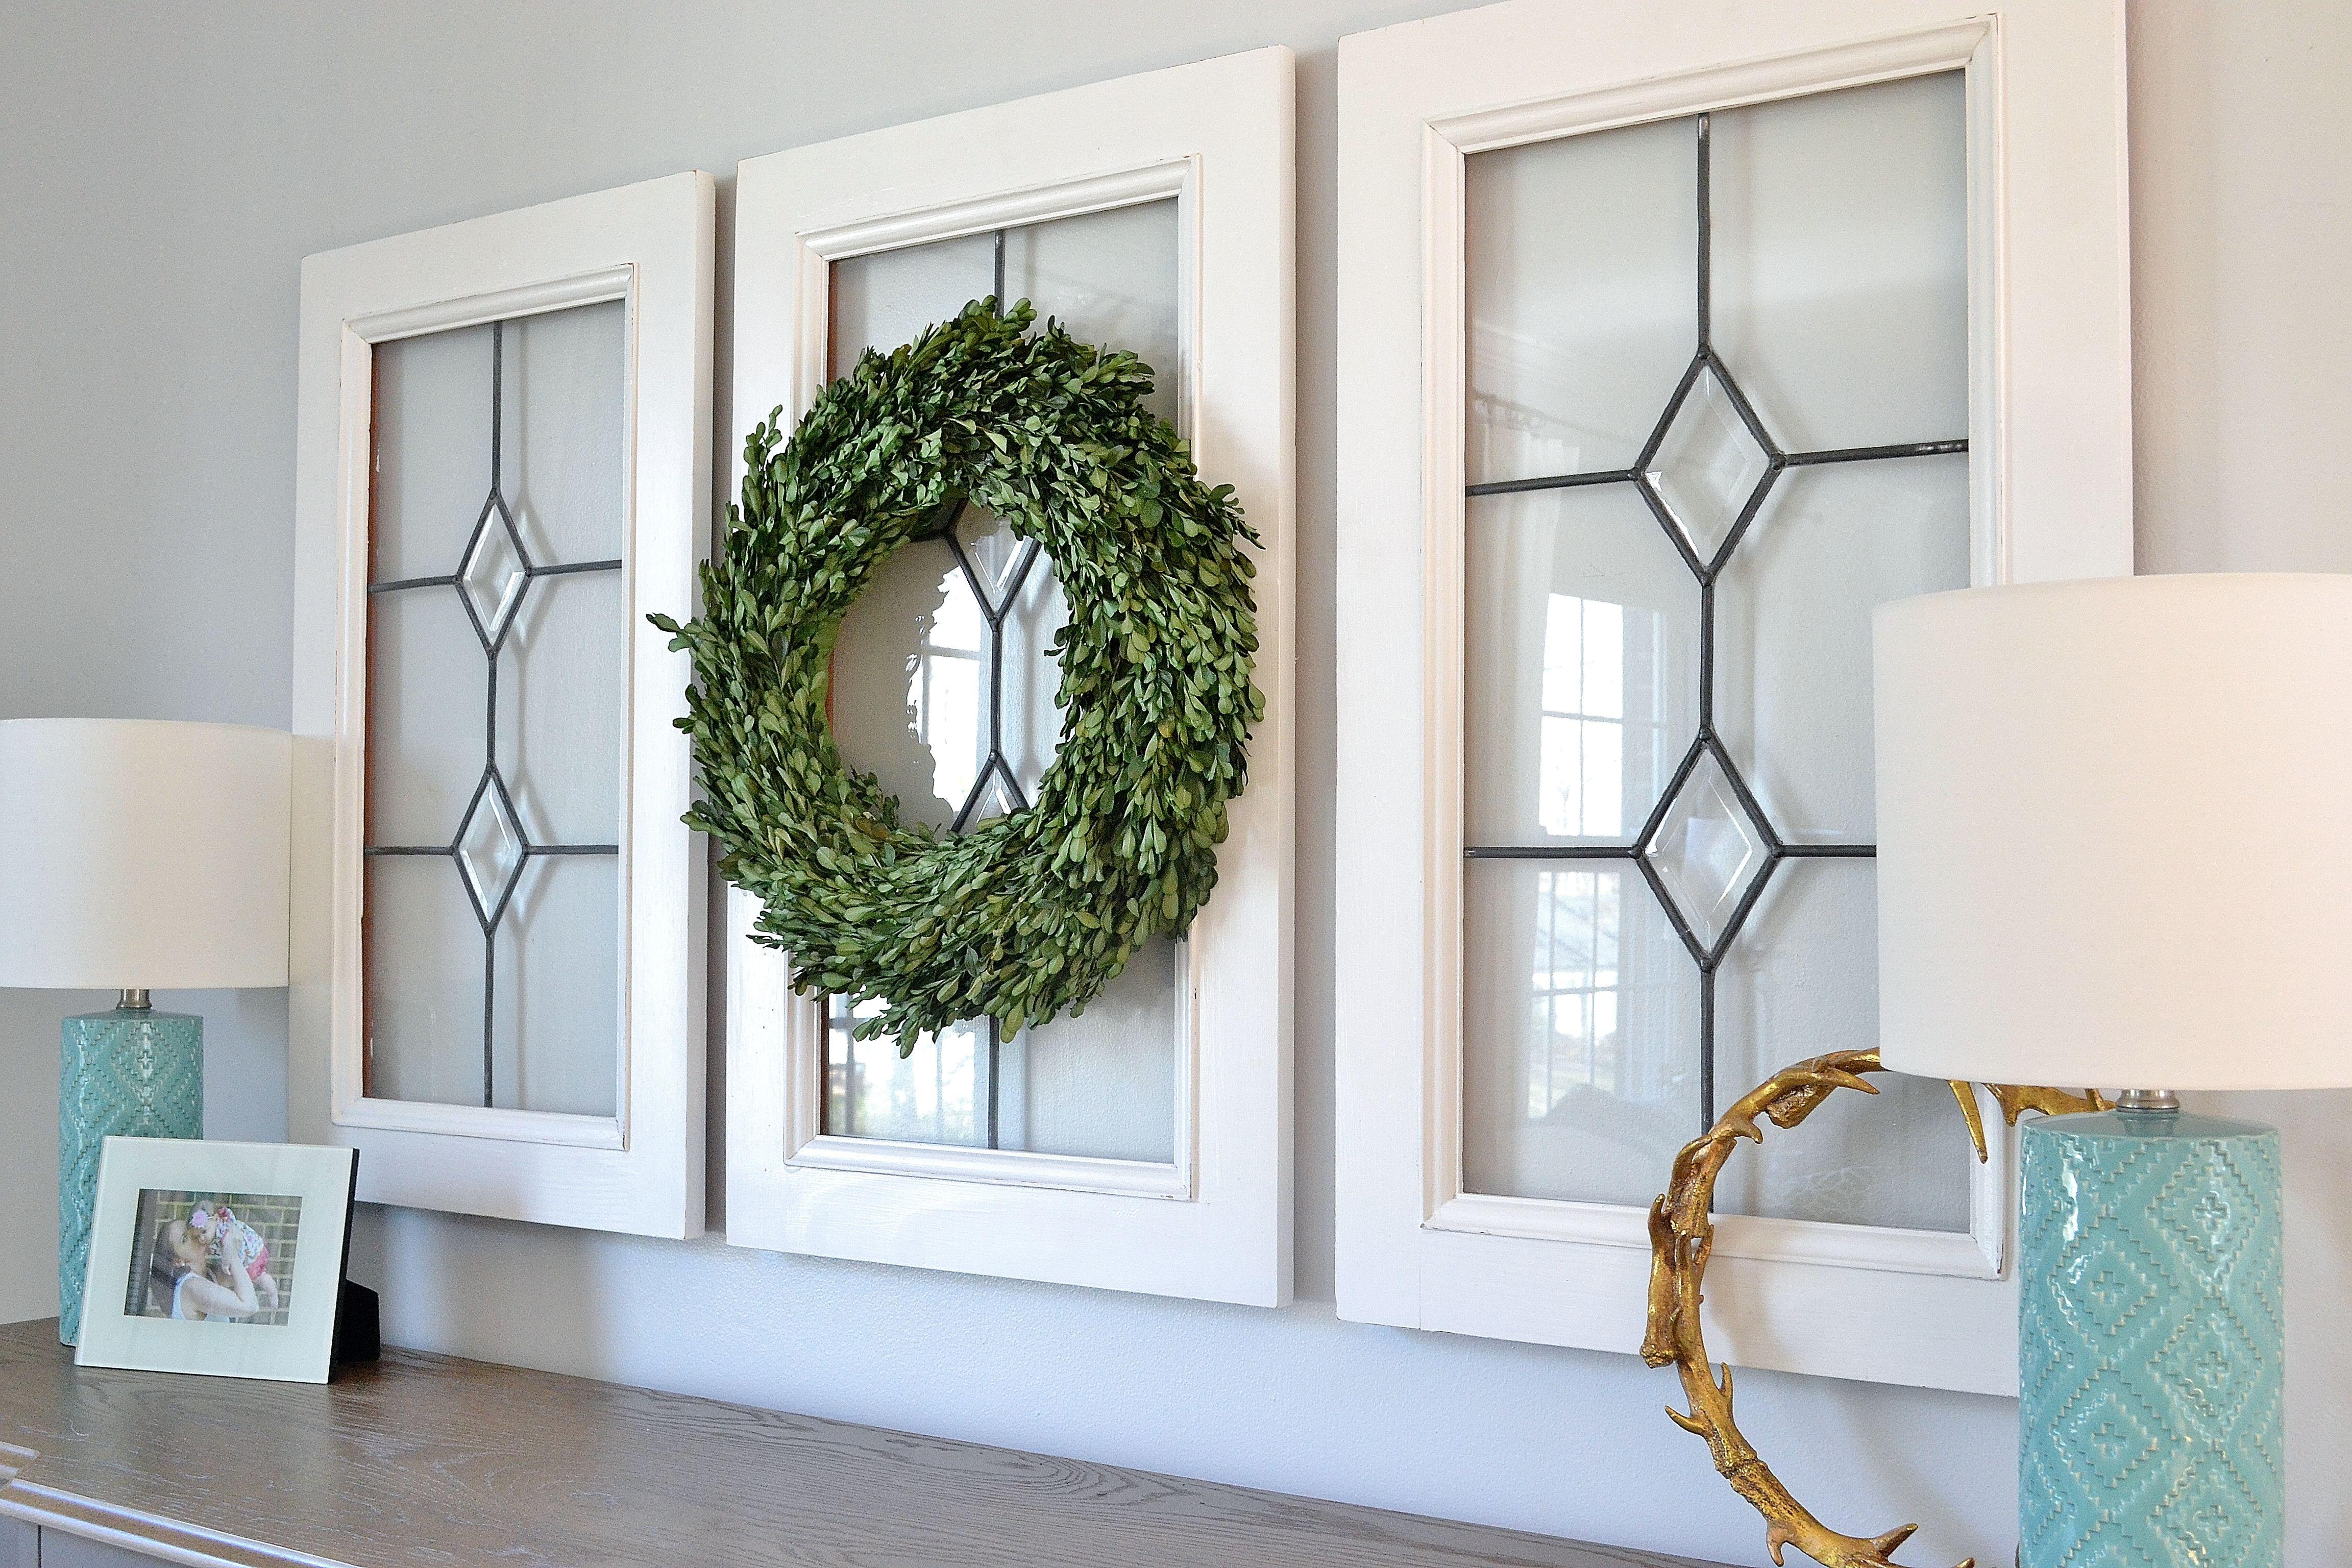 Window Pane Decor How To Use Old Window Frames Window Wall